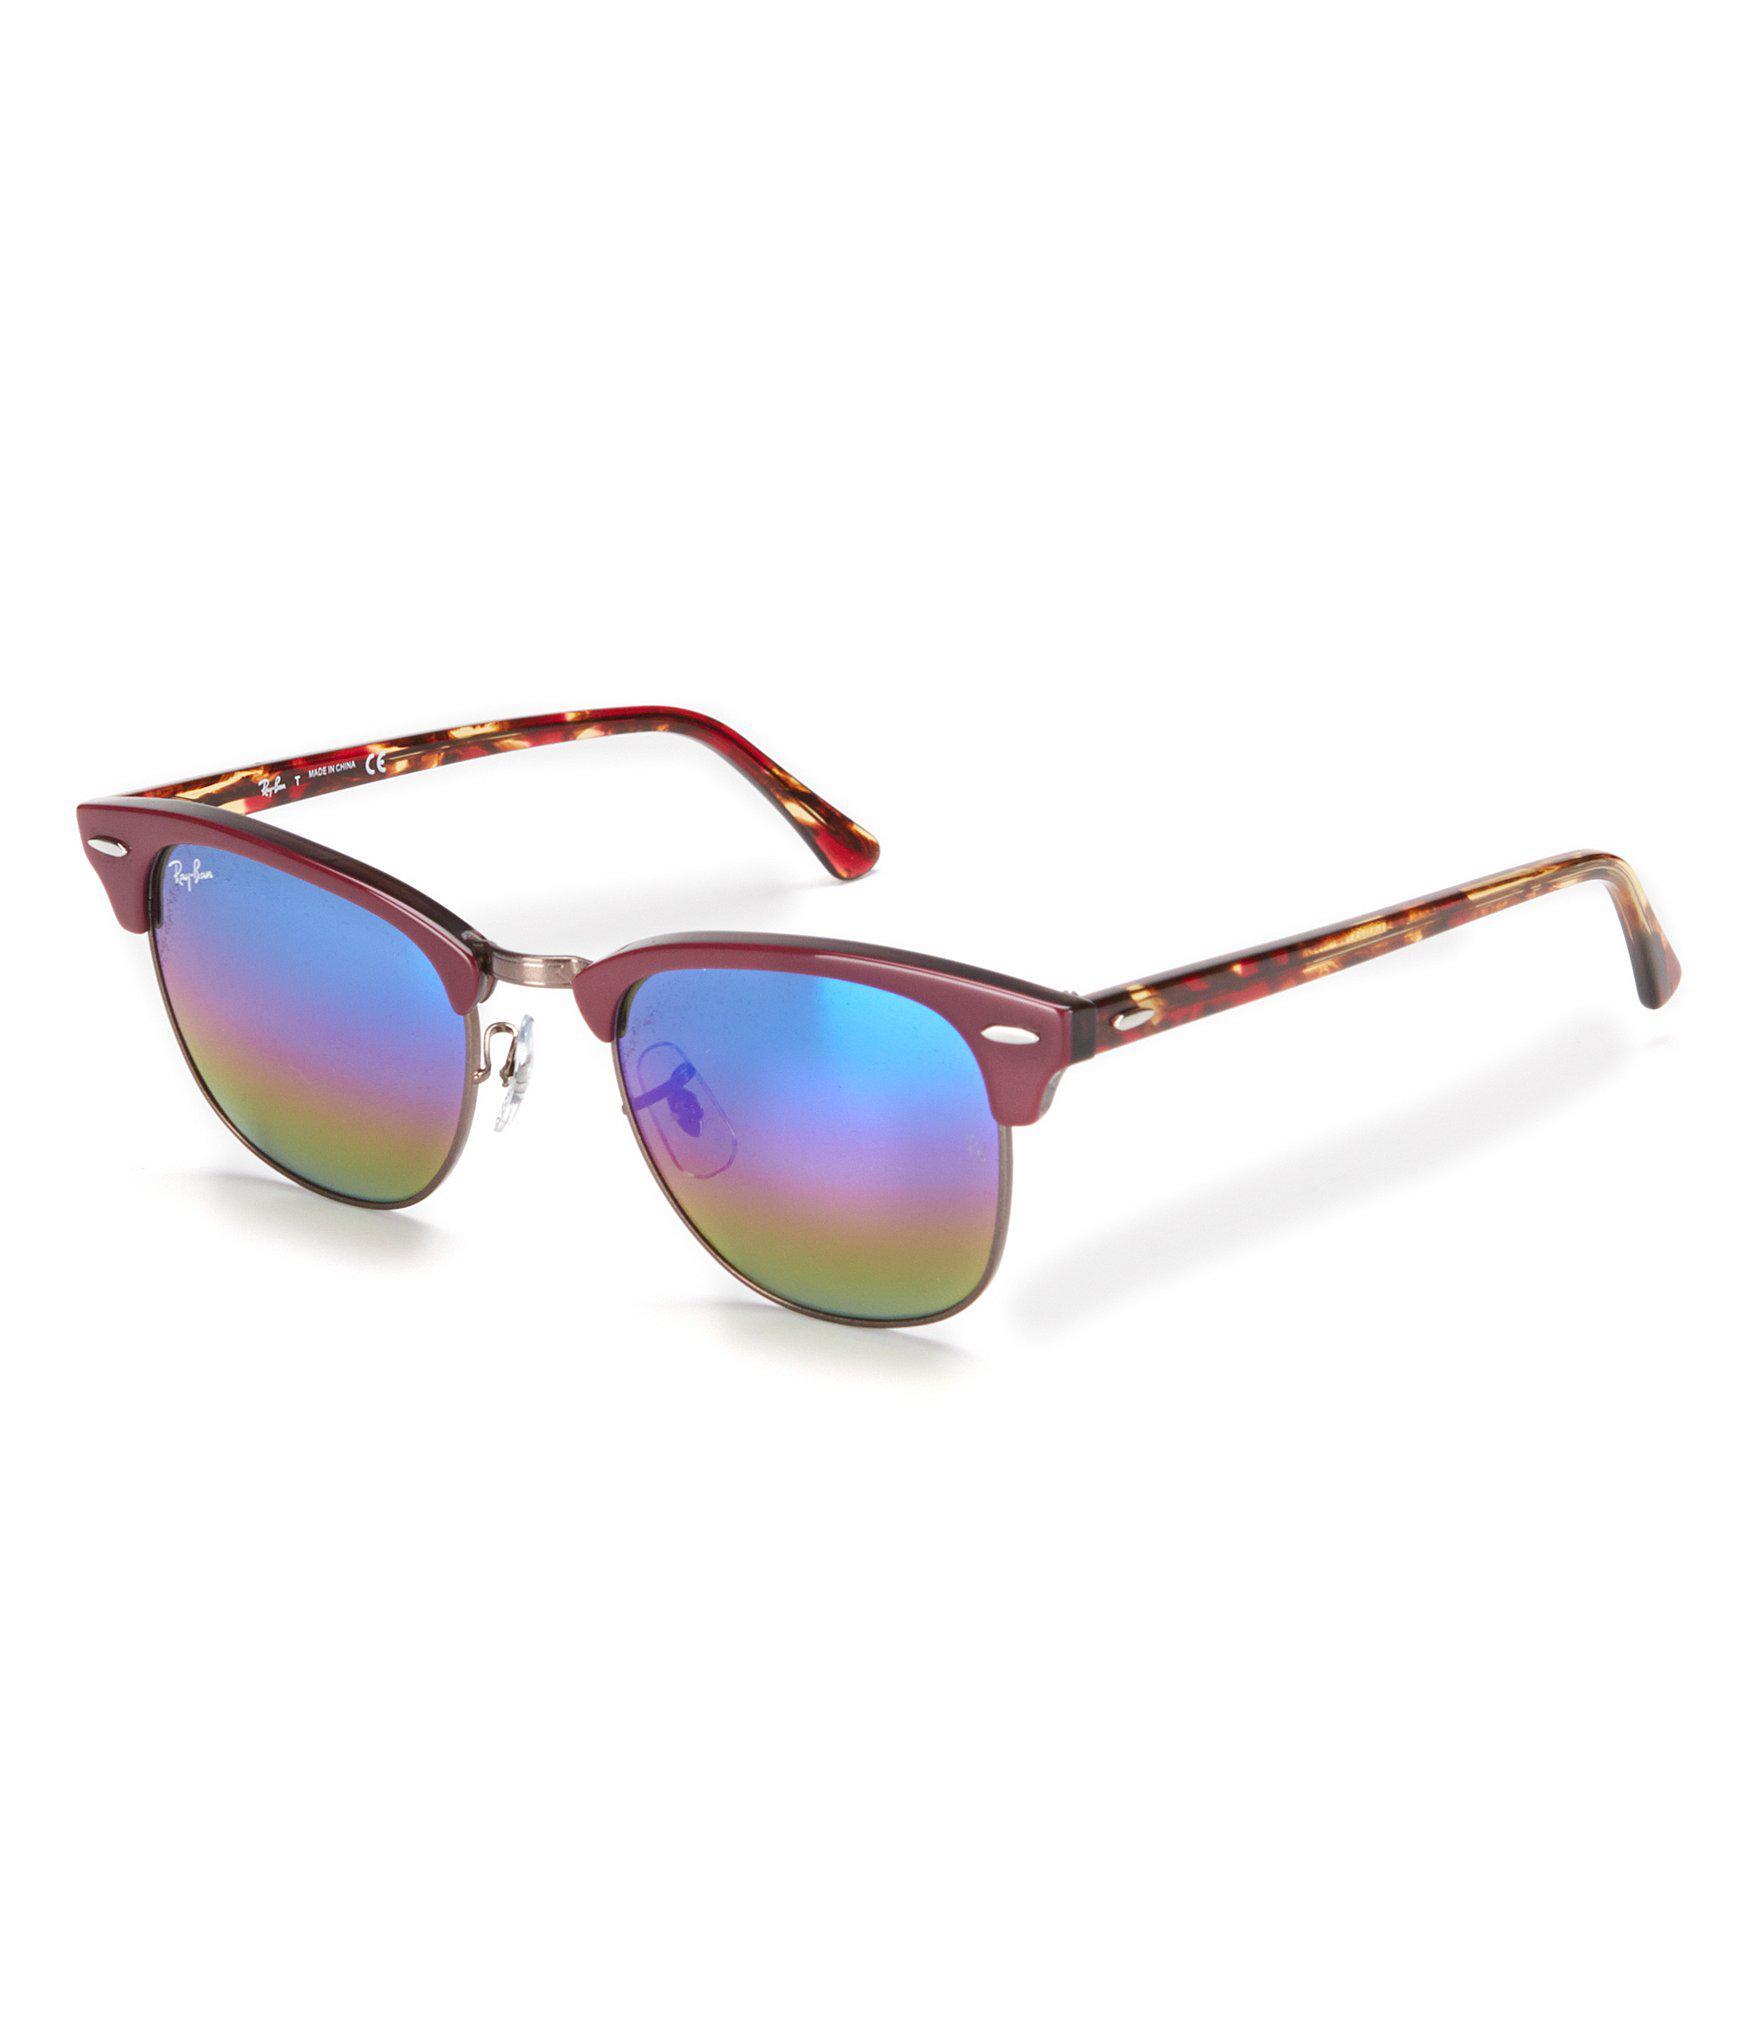 c92228df5667 Gallery. Previously sold at  Dillard s · Men s Ray Ban Clubmaster Men s  Wayfarer Sunglasses ...